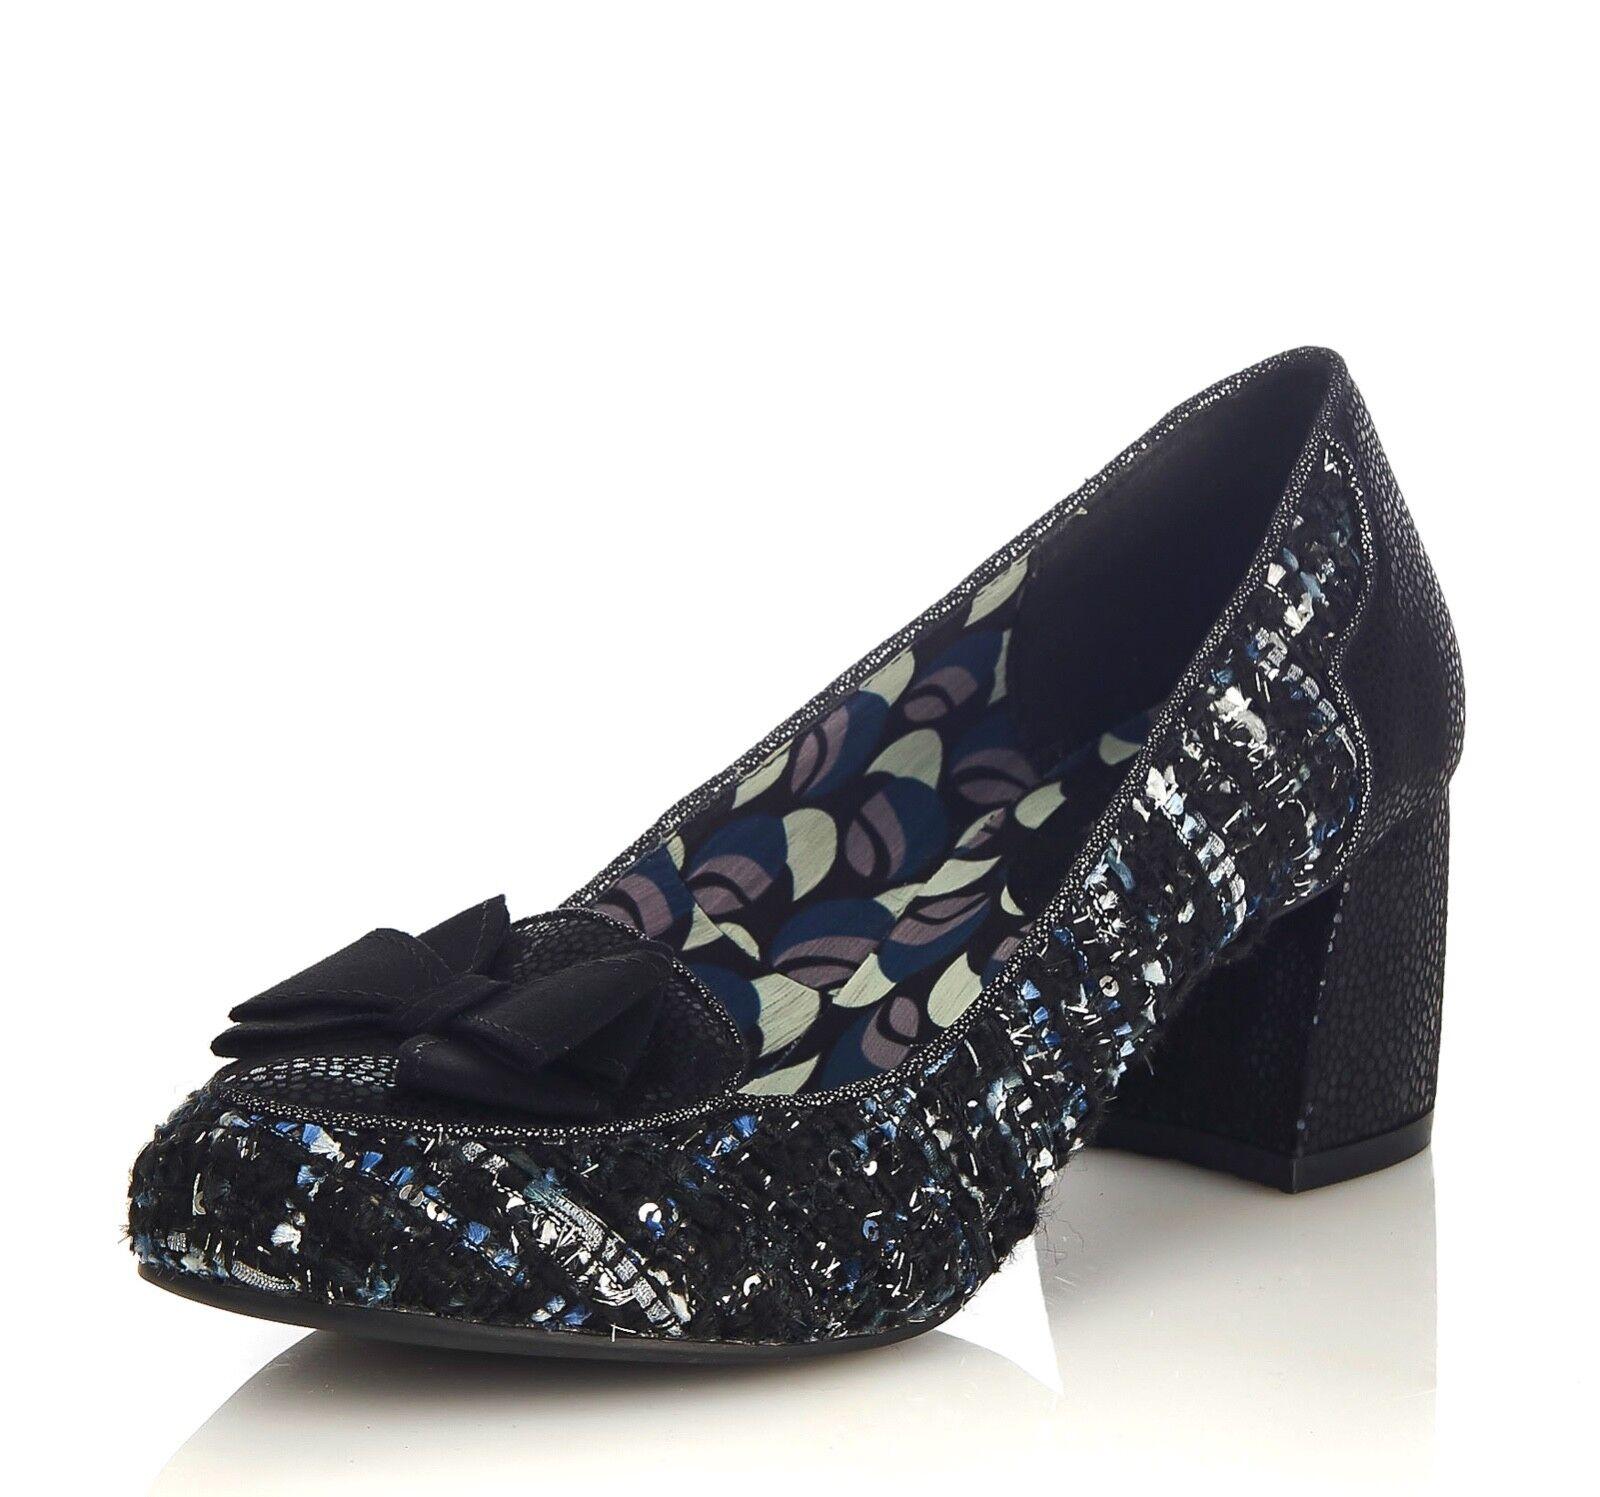 Ruby Shoo NEW Thalia noir tweed block mid heel loafer chaussures Tailles 3-8